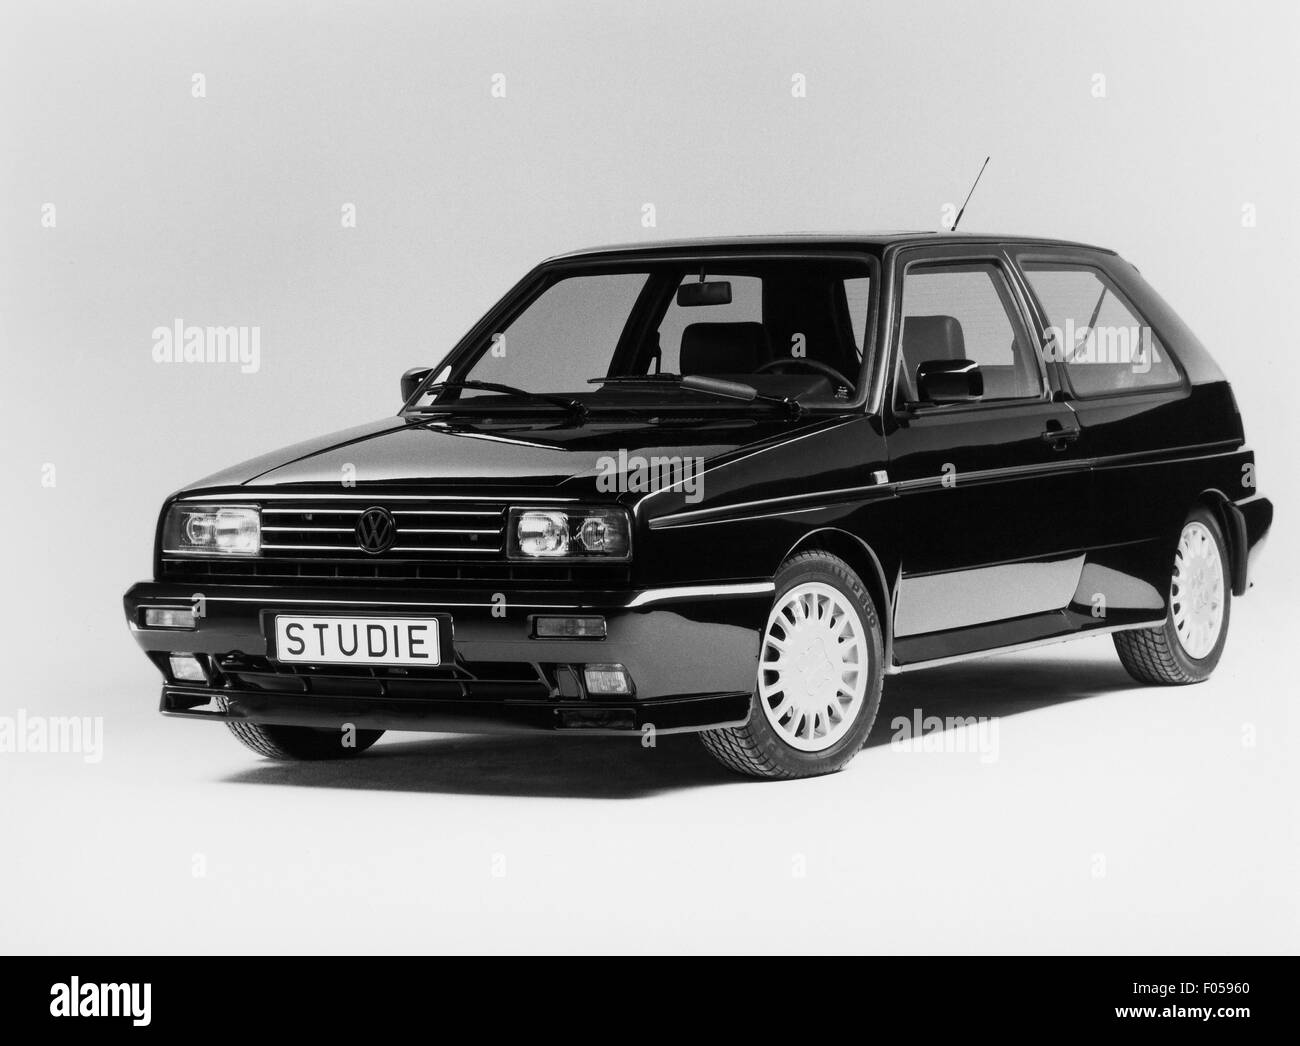 Transporte / Transporte, coche, vehículo variantes, Volkswagen, VW Golf concepto vehículo, 1980, Additional Imagen De Stock